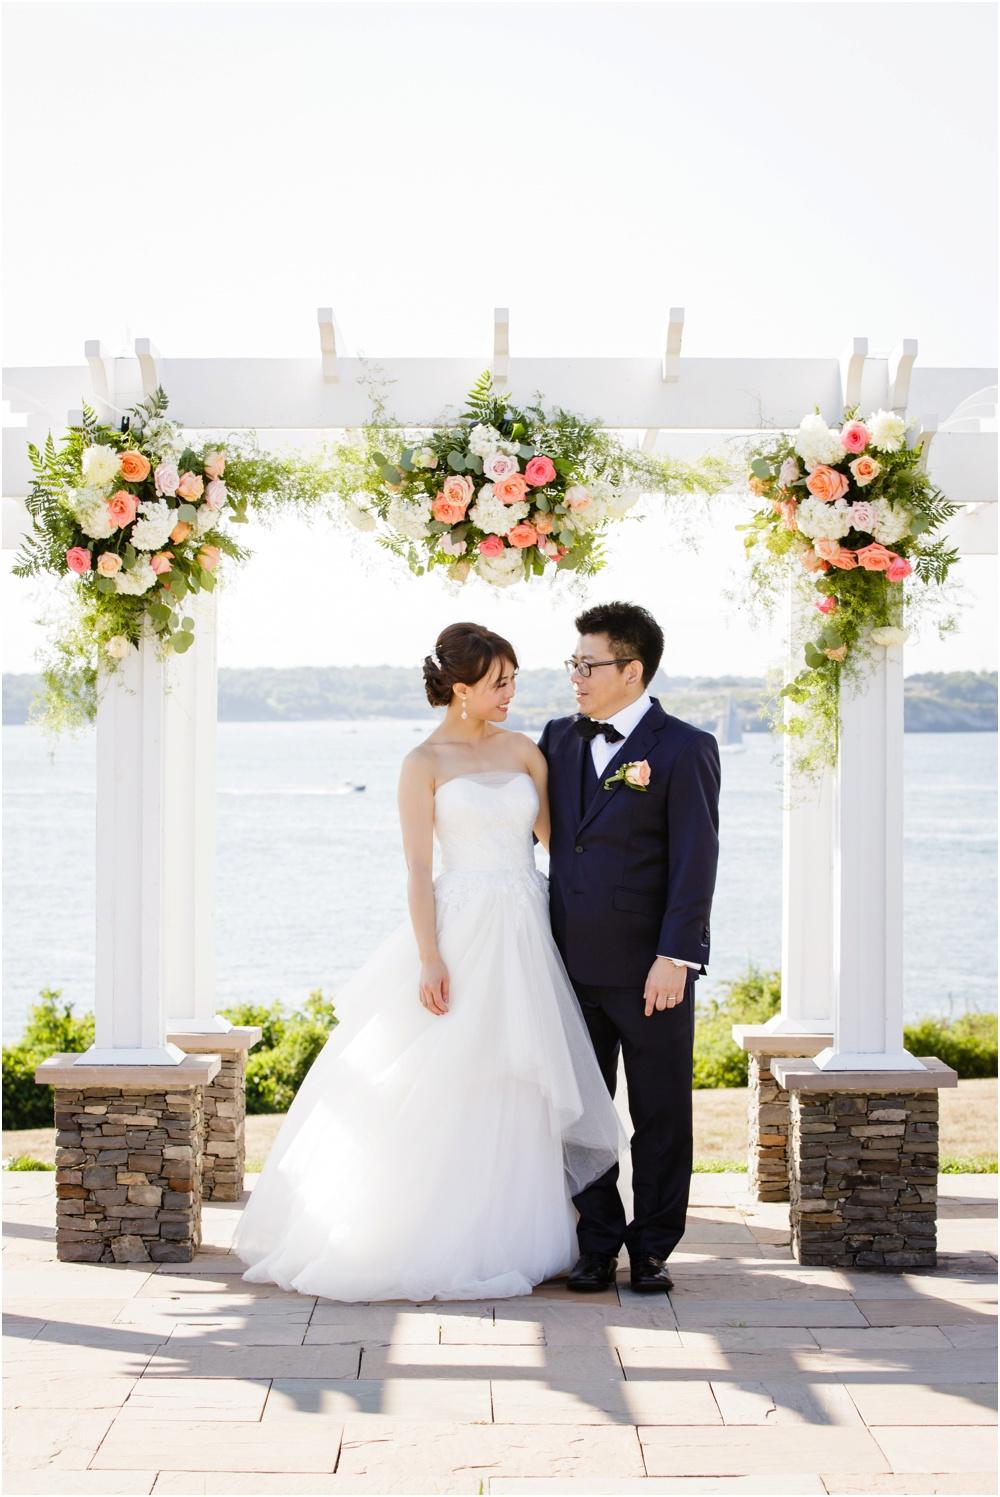 RI-Wedding-Photographer-Lefebvre-Photo-Blog_3197.jpg